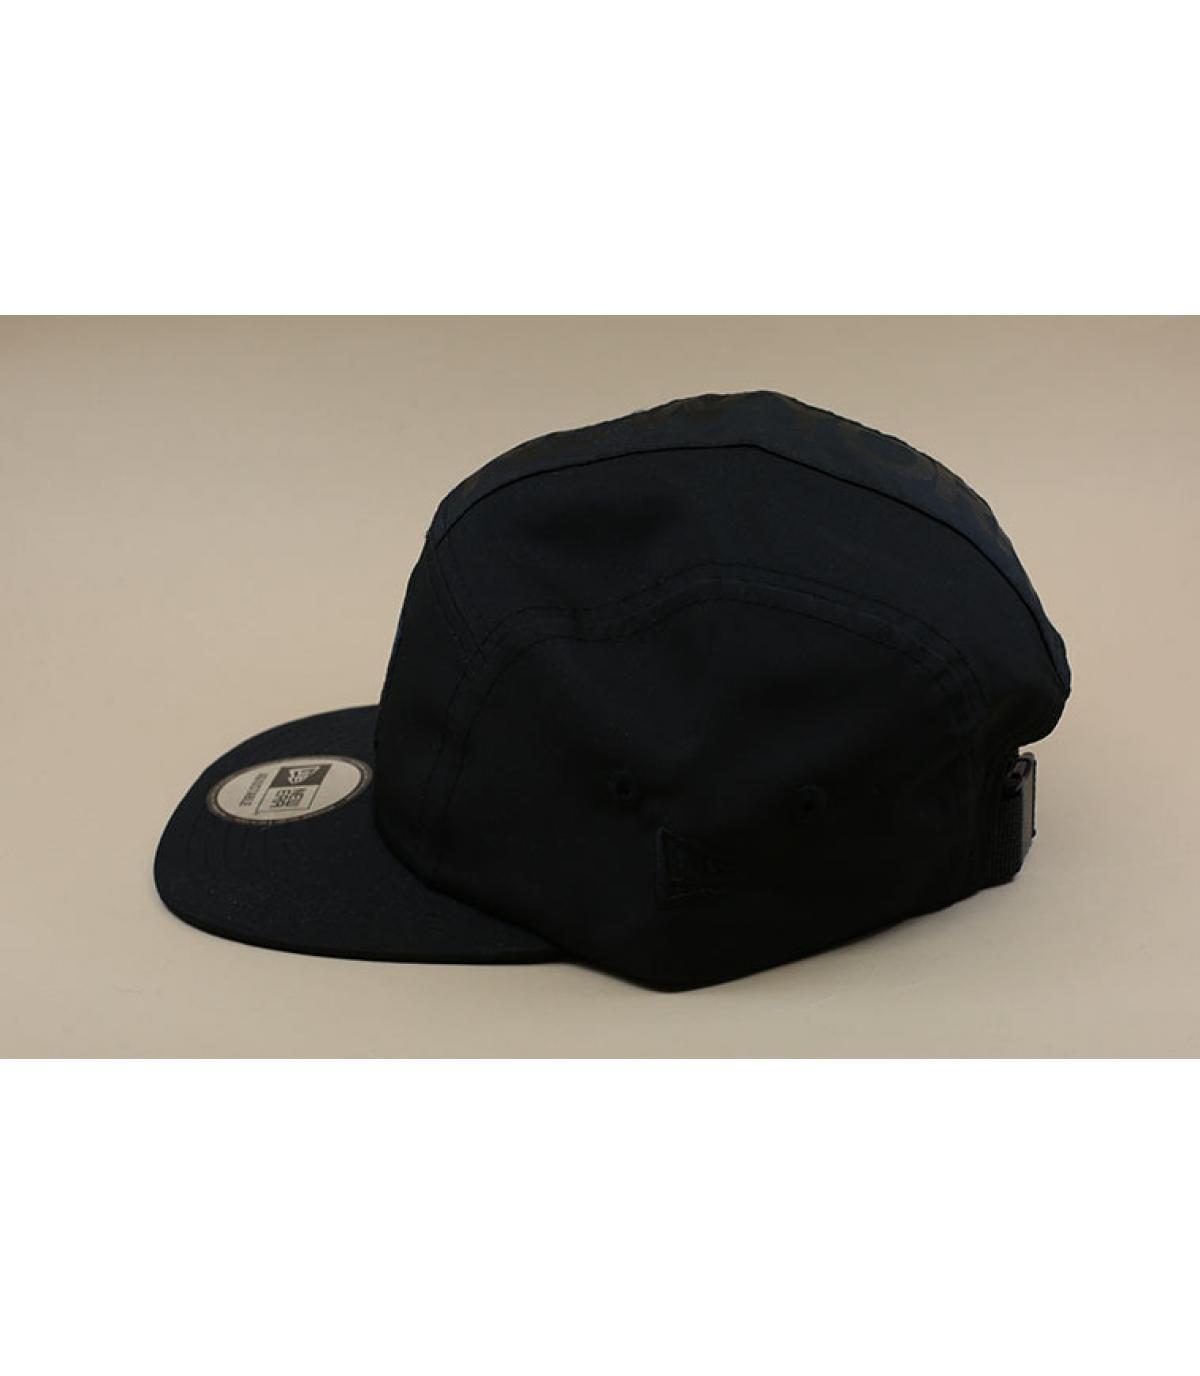 Détails Casquette MLB Camper NY black - image 4